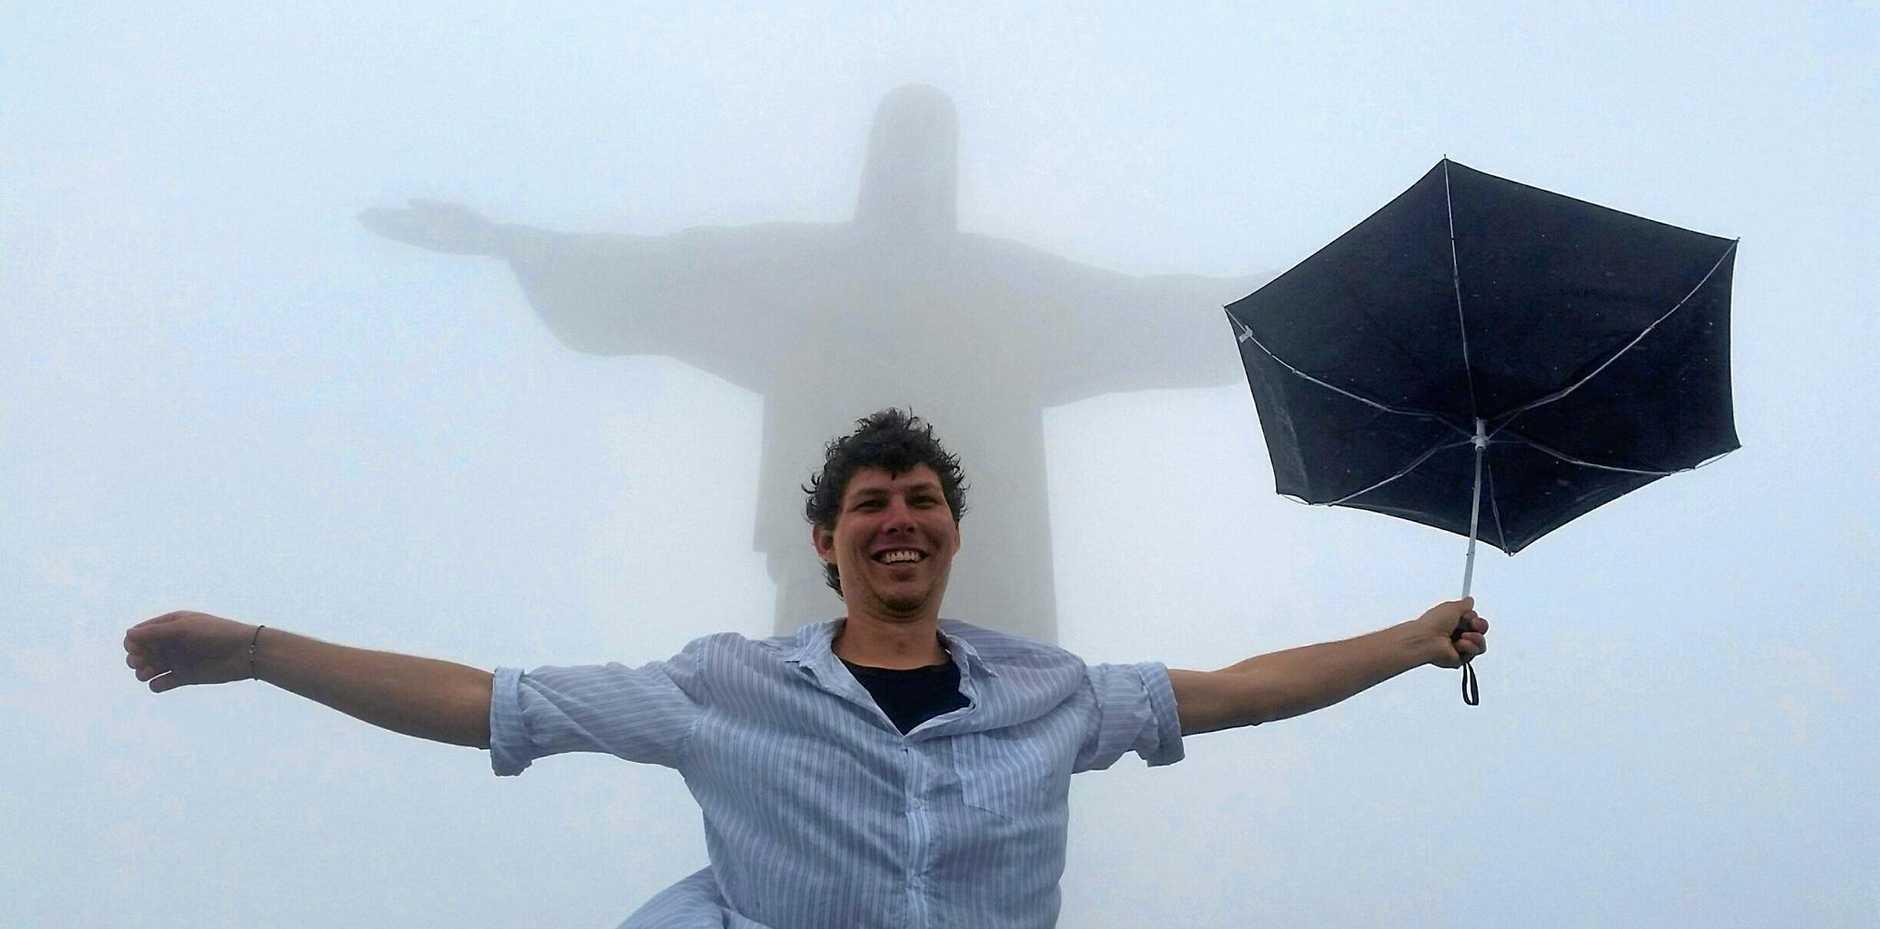 BIG PLANS: Traveloris founder Daniel Blickling on holidays.